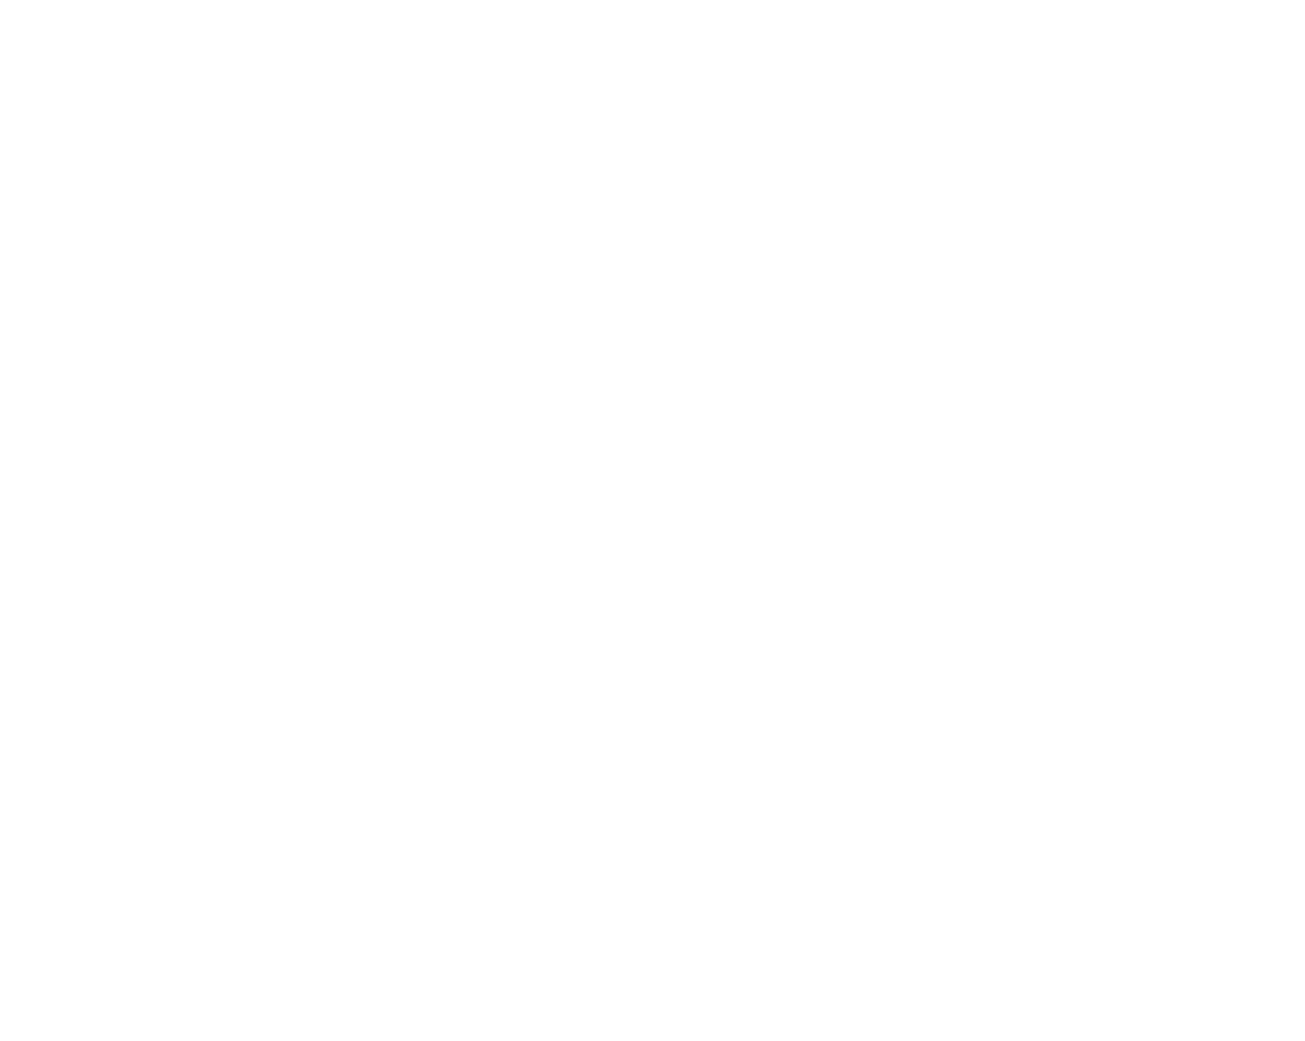 1-visionarchlogo.png